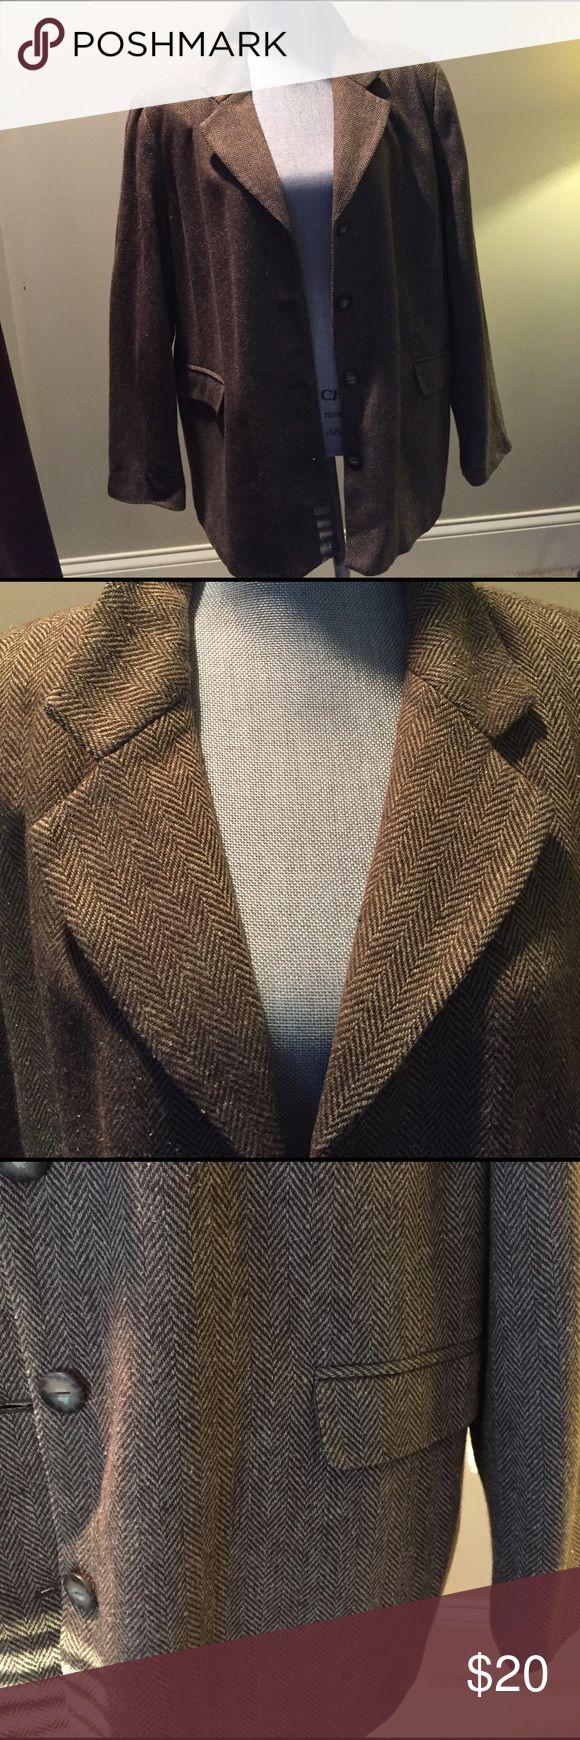 Women's Tweed Jacket Size 2X . Tweed Jacket Size 2X . Fully lined . 58% viscose, 30% wool, 12% silk. Gently worn. Smoke free environment. Cynthia Taylor Jackets & Coats Blazers